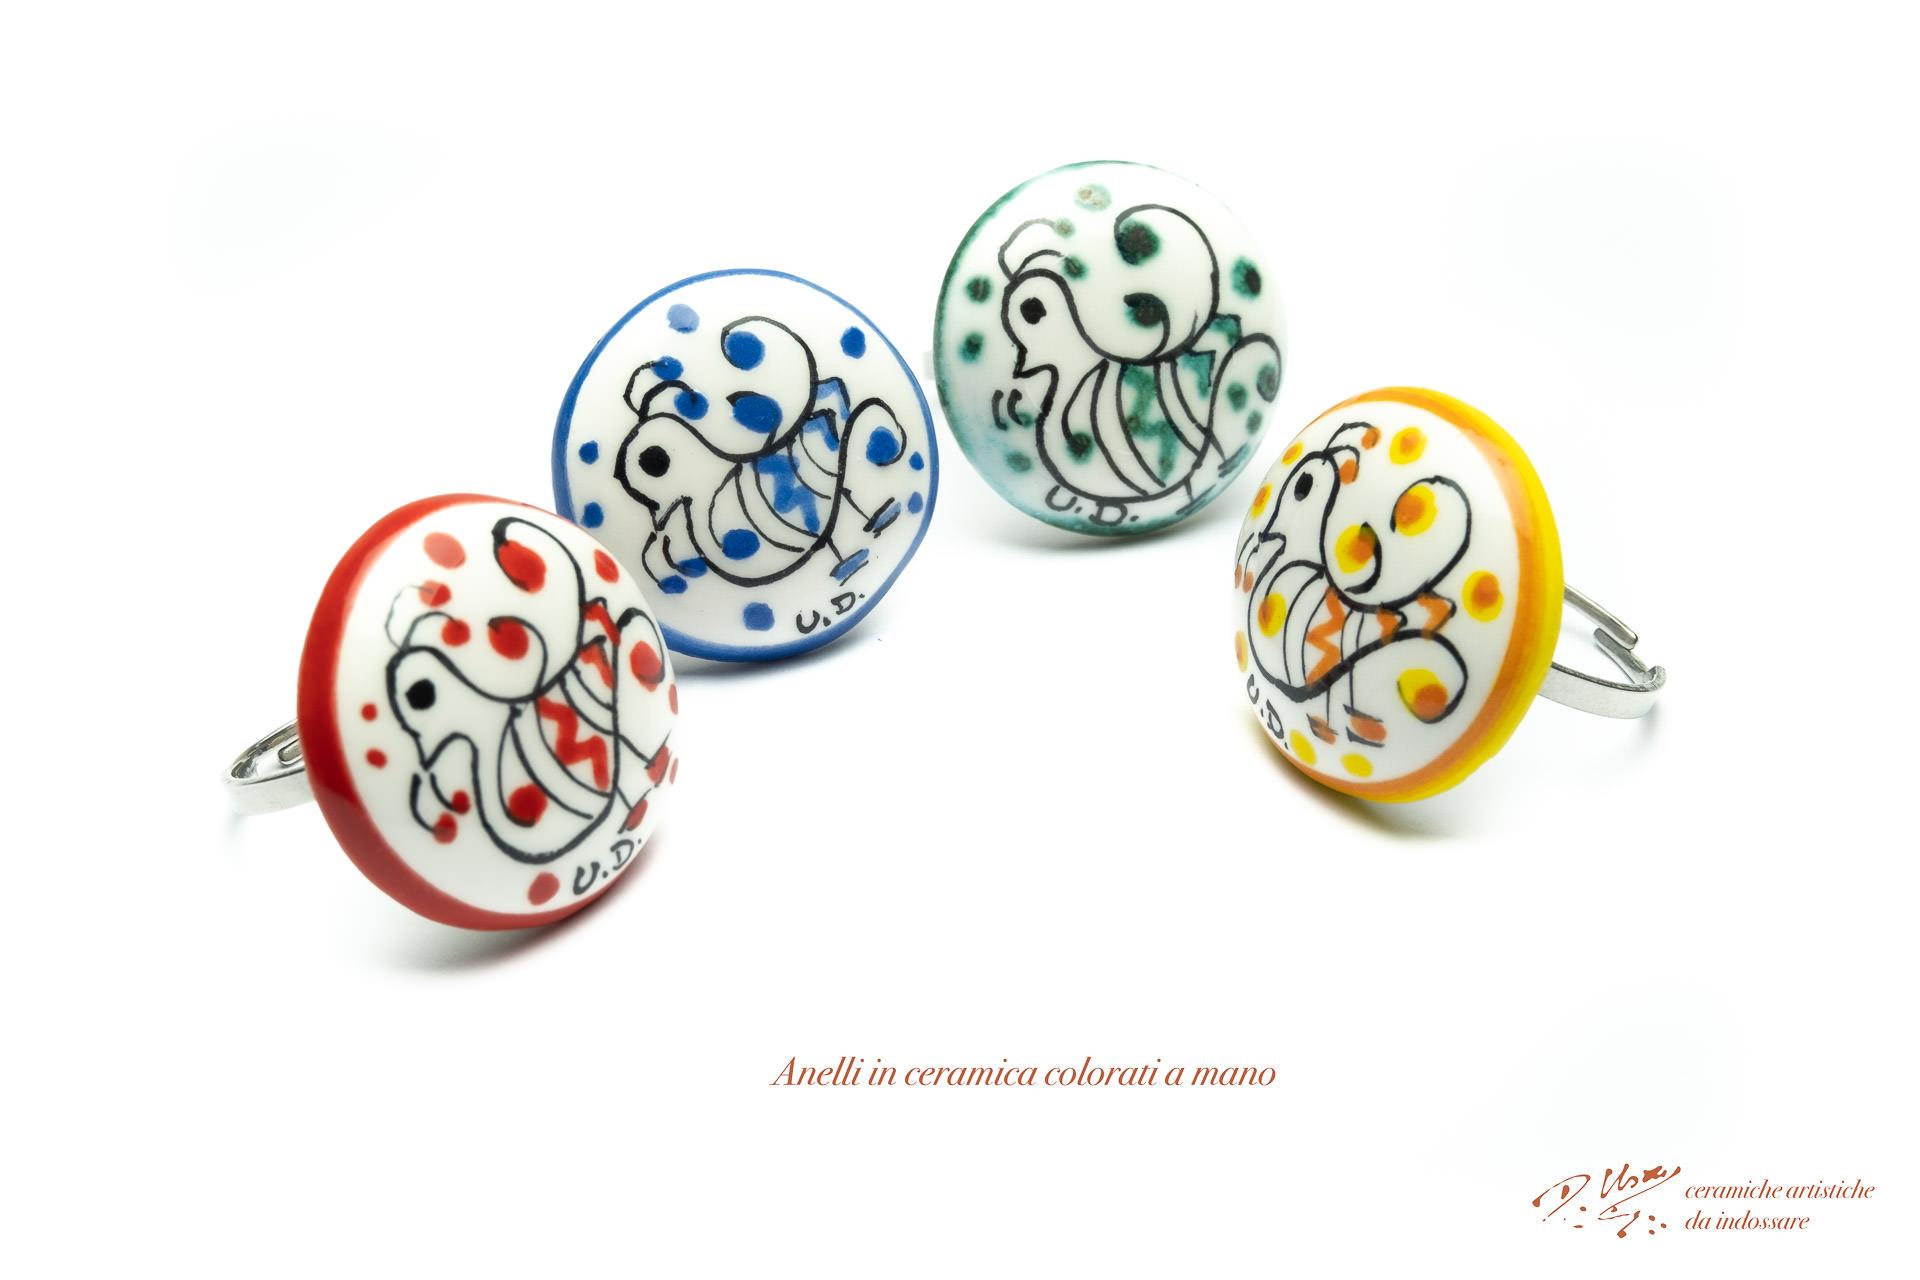 ceramiche artistiche da indossare Doriana Usai 005